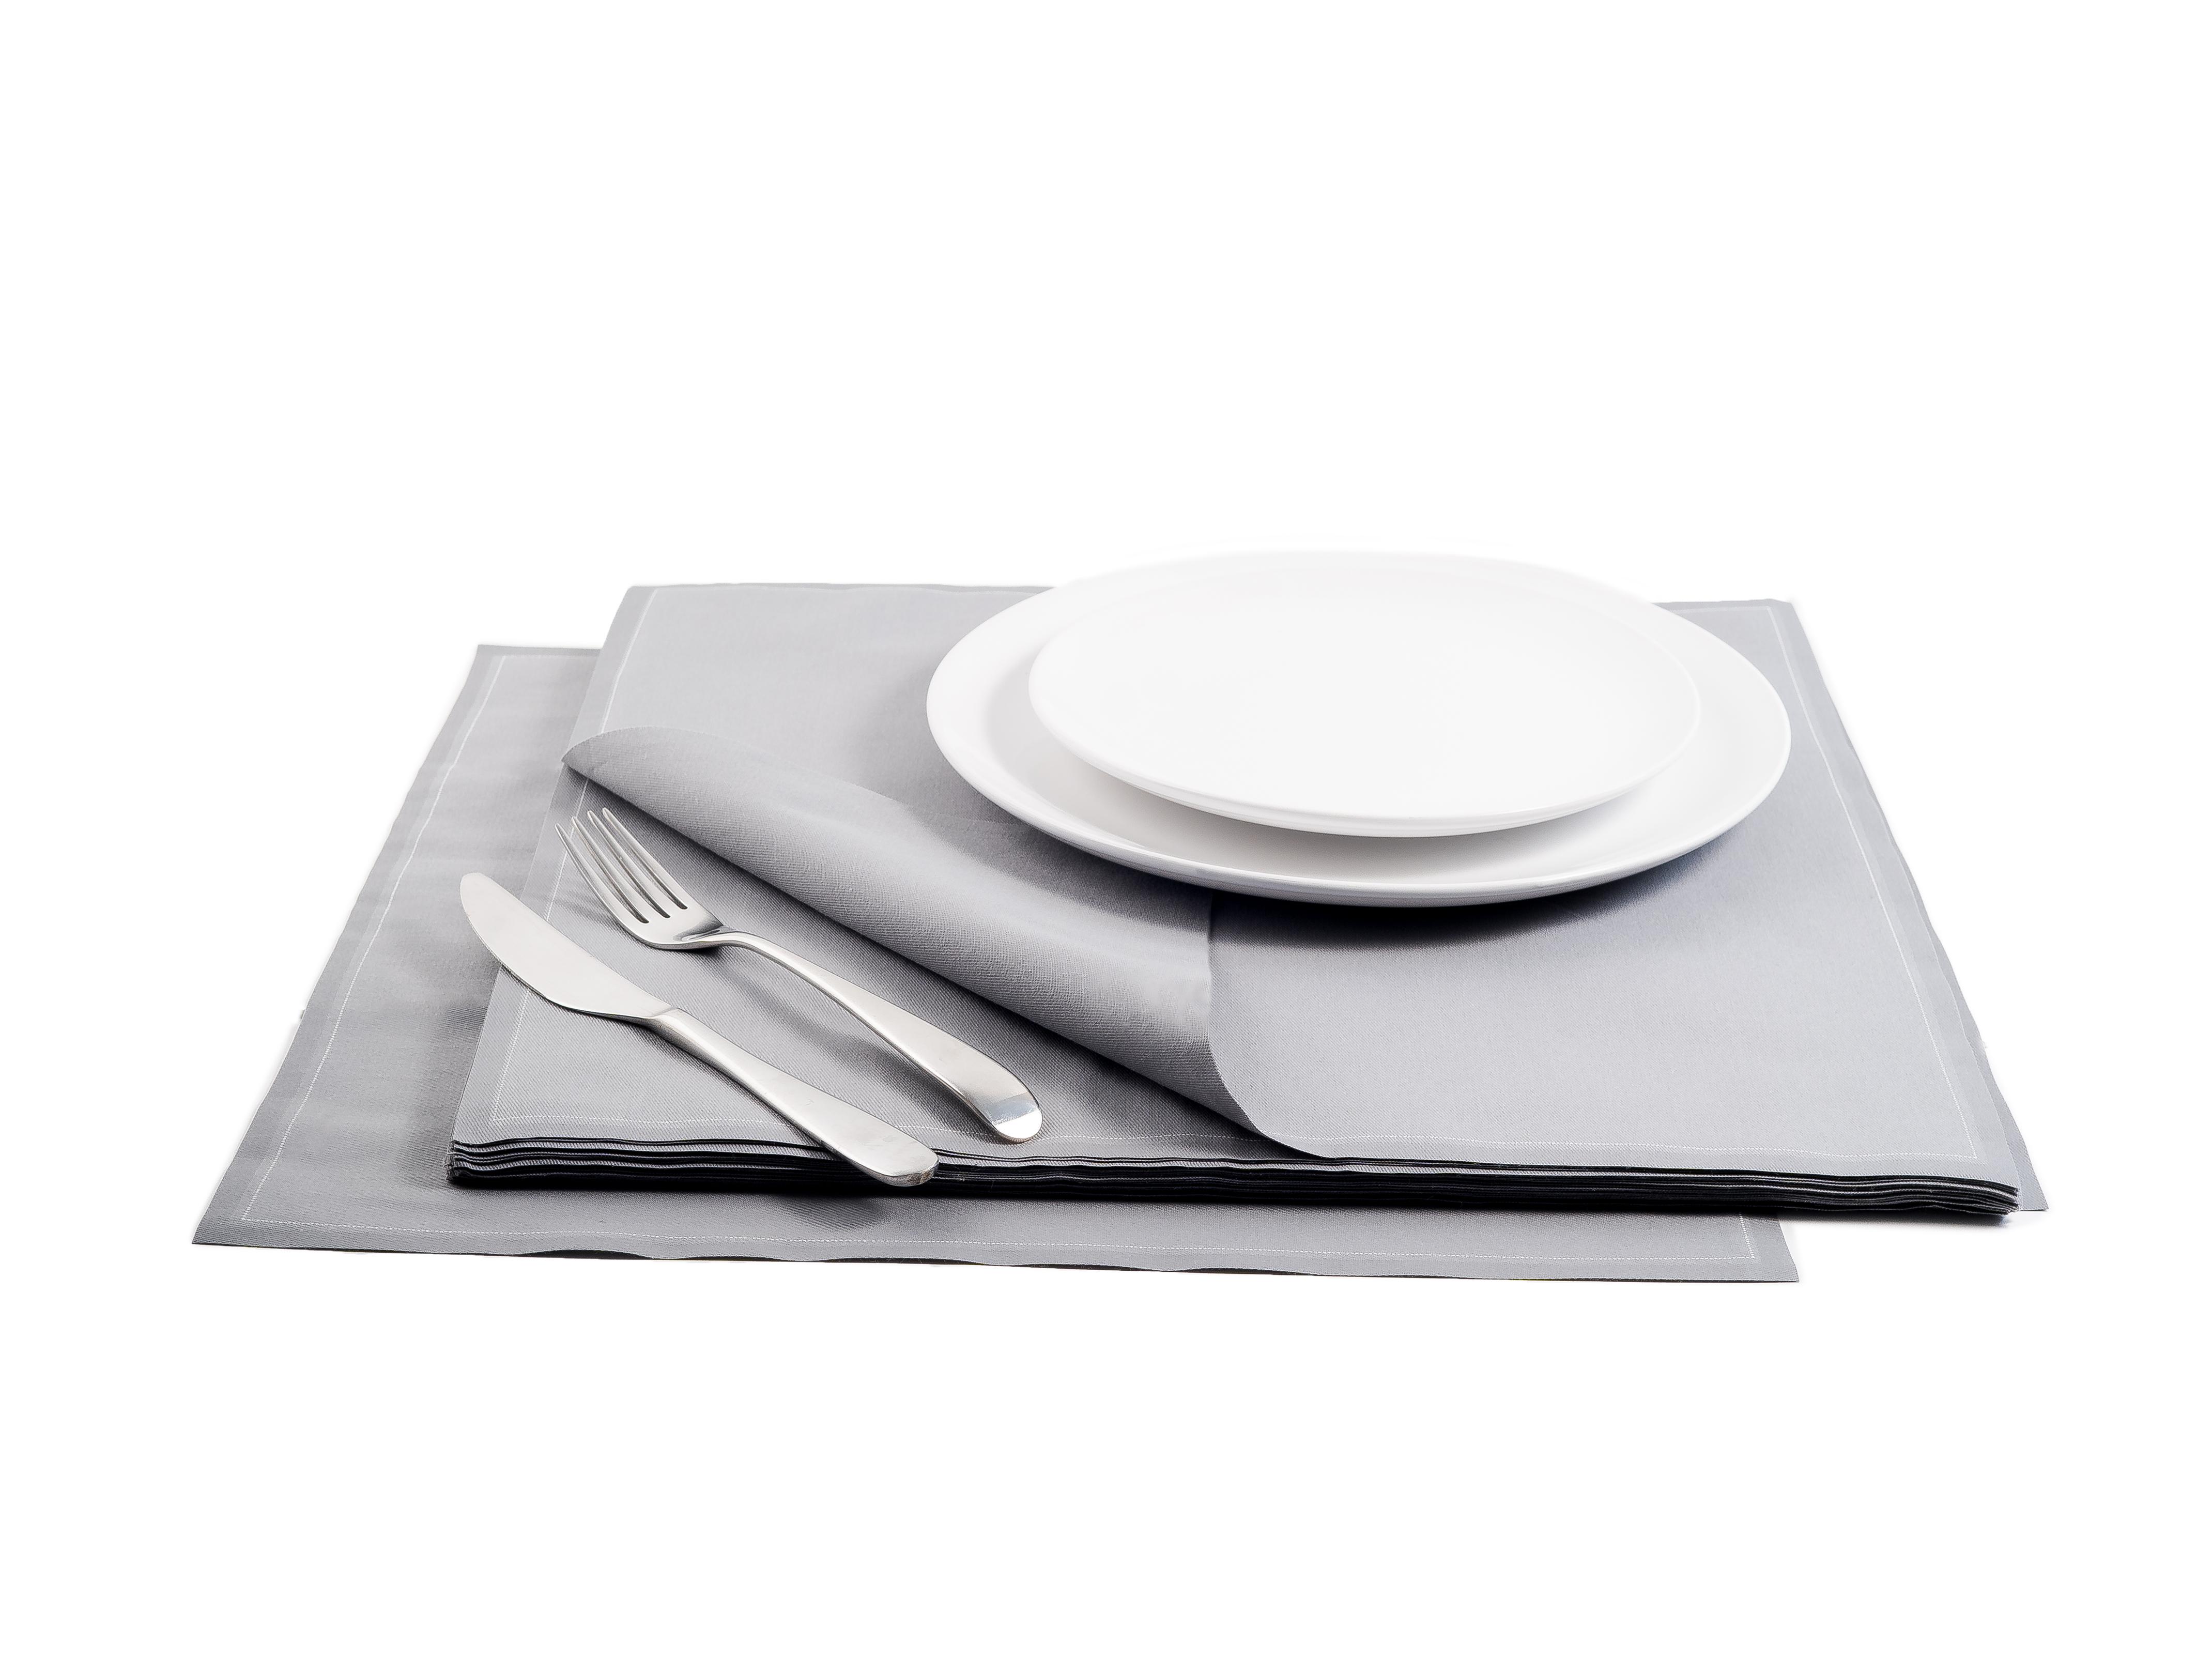 "Grey Cotton Premium Dinner (200 GSM) - 15.8"" x 15.8"" - 250 Units"